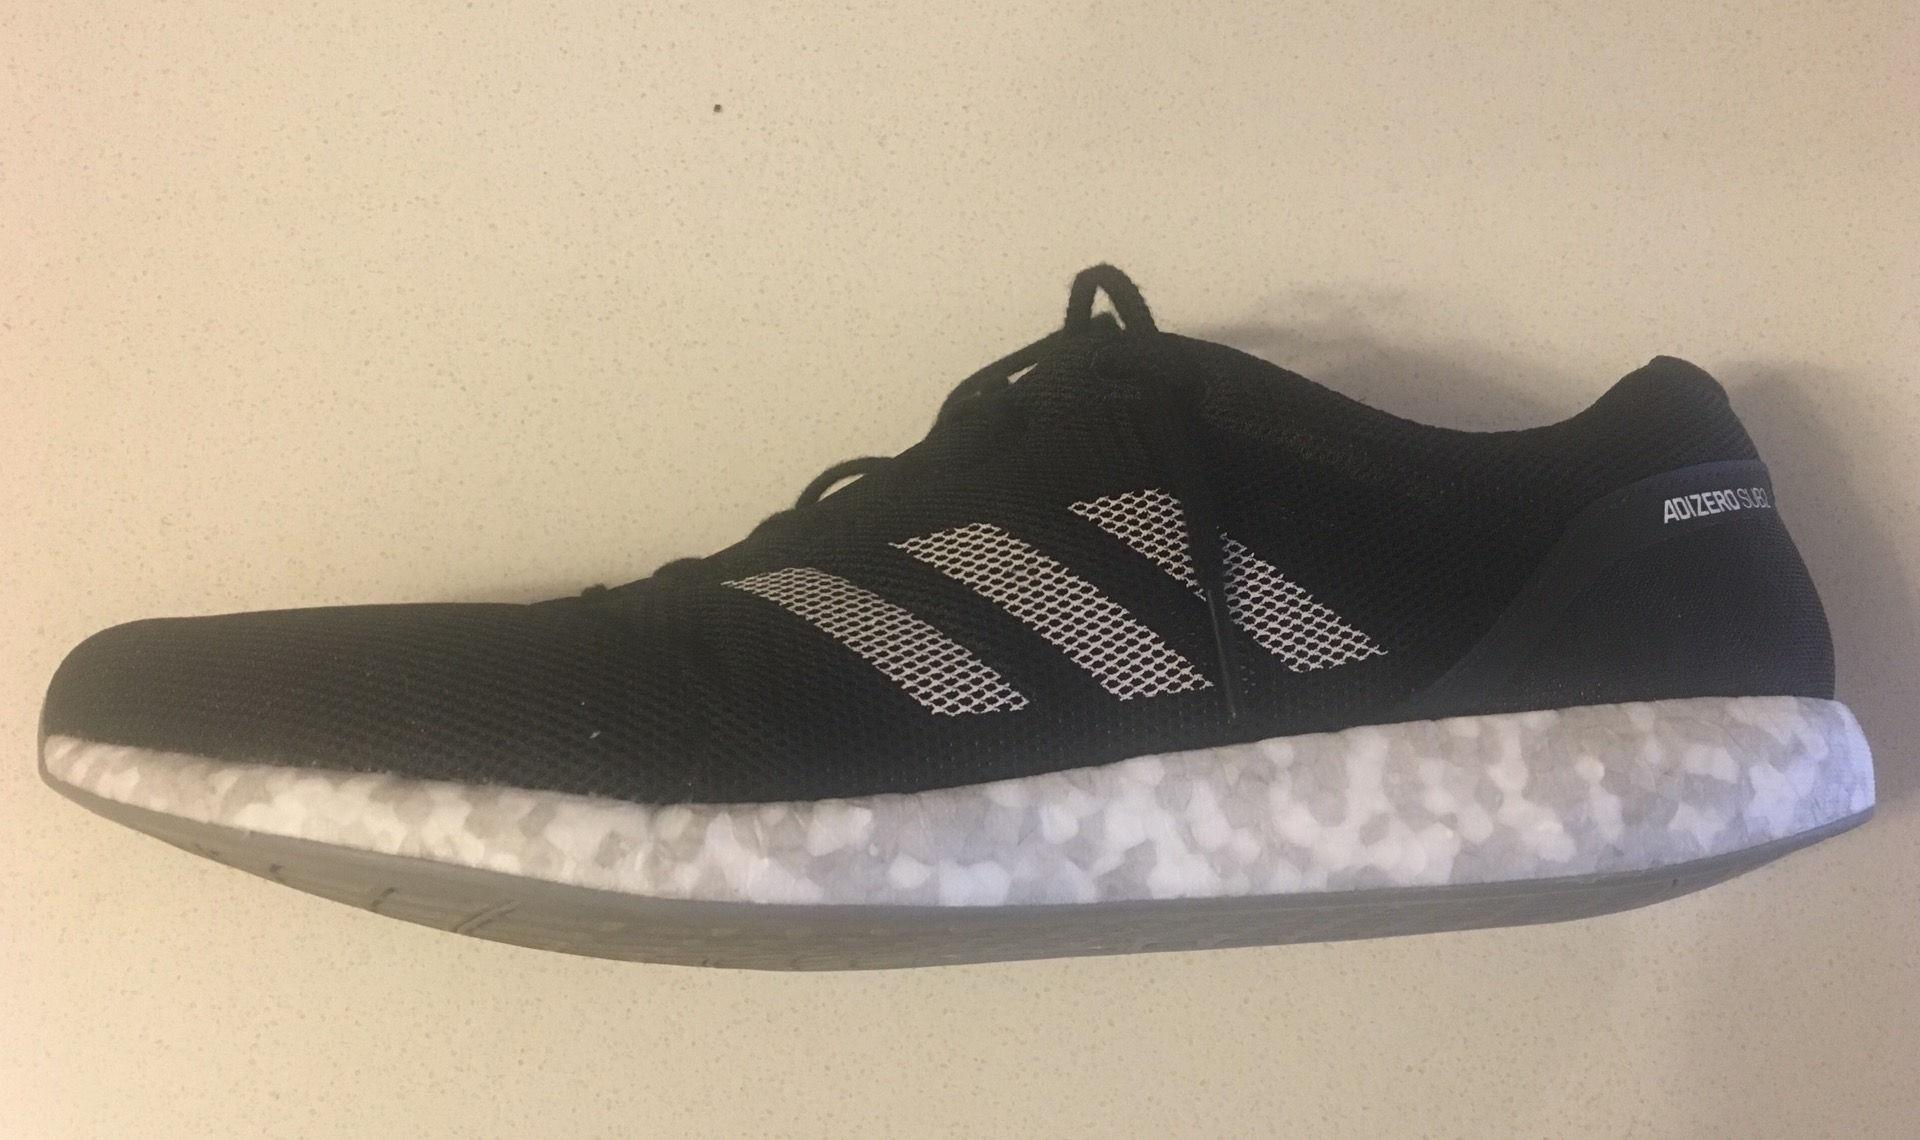 Outdoor Schuhe Adidas Preis Fabrik Damen Schuhe vJDdHJ